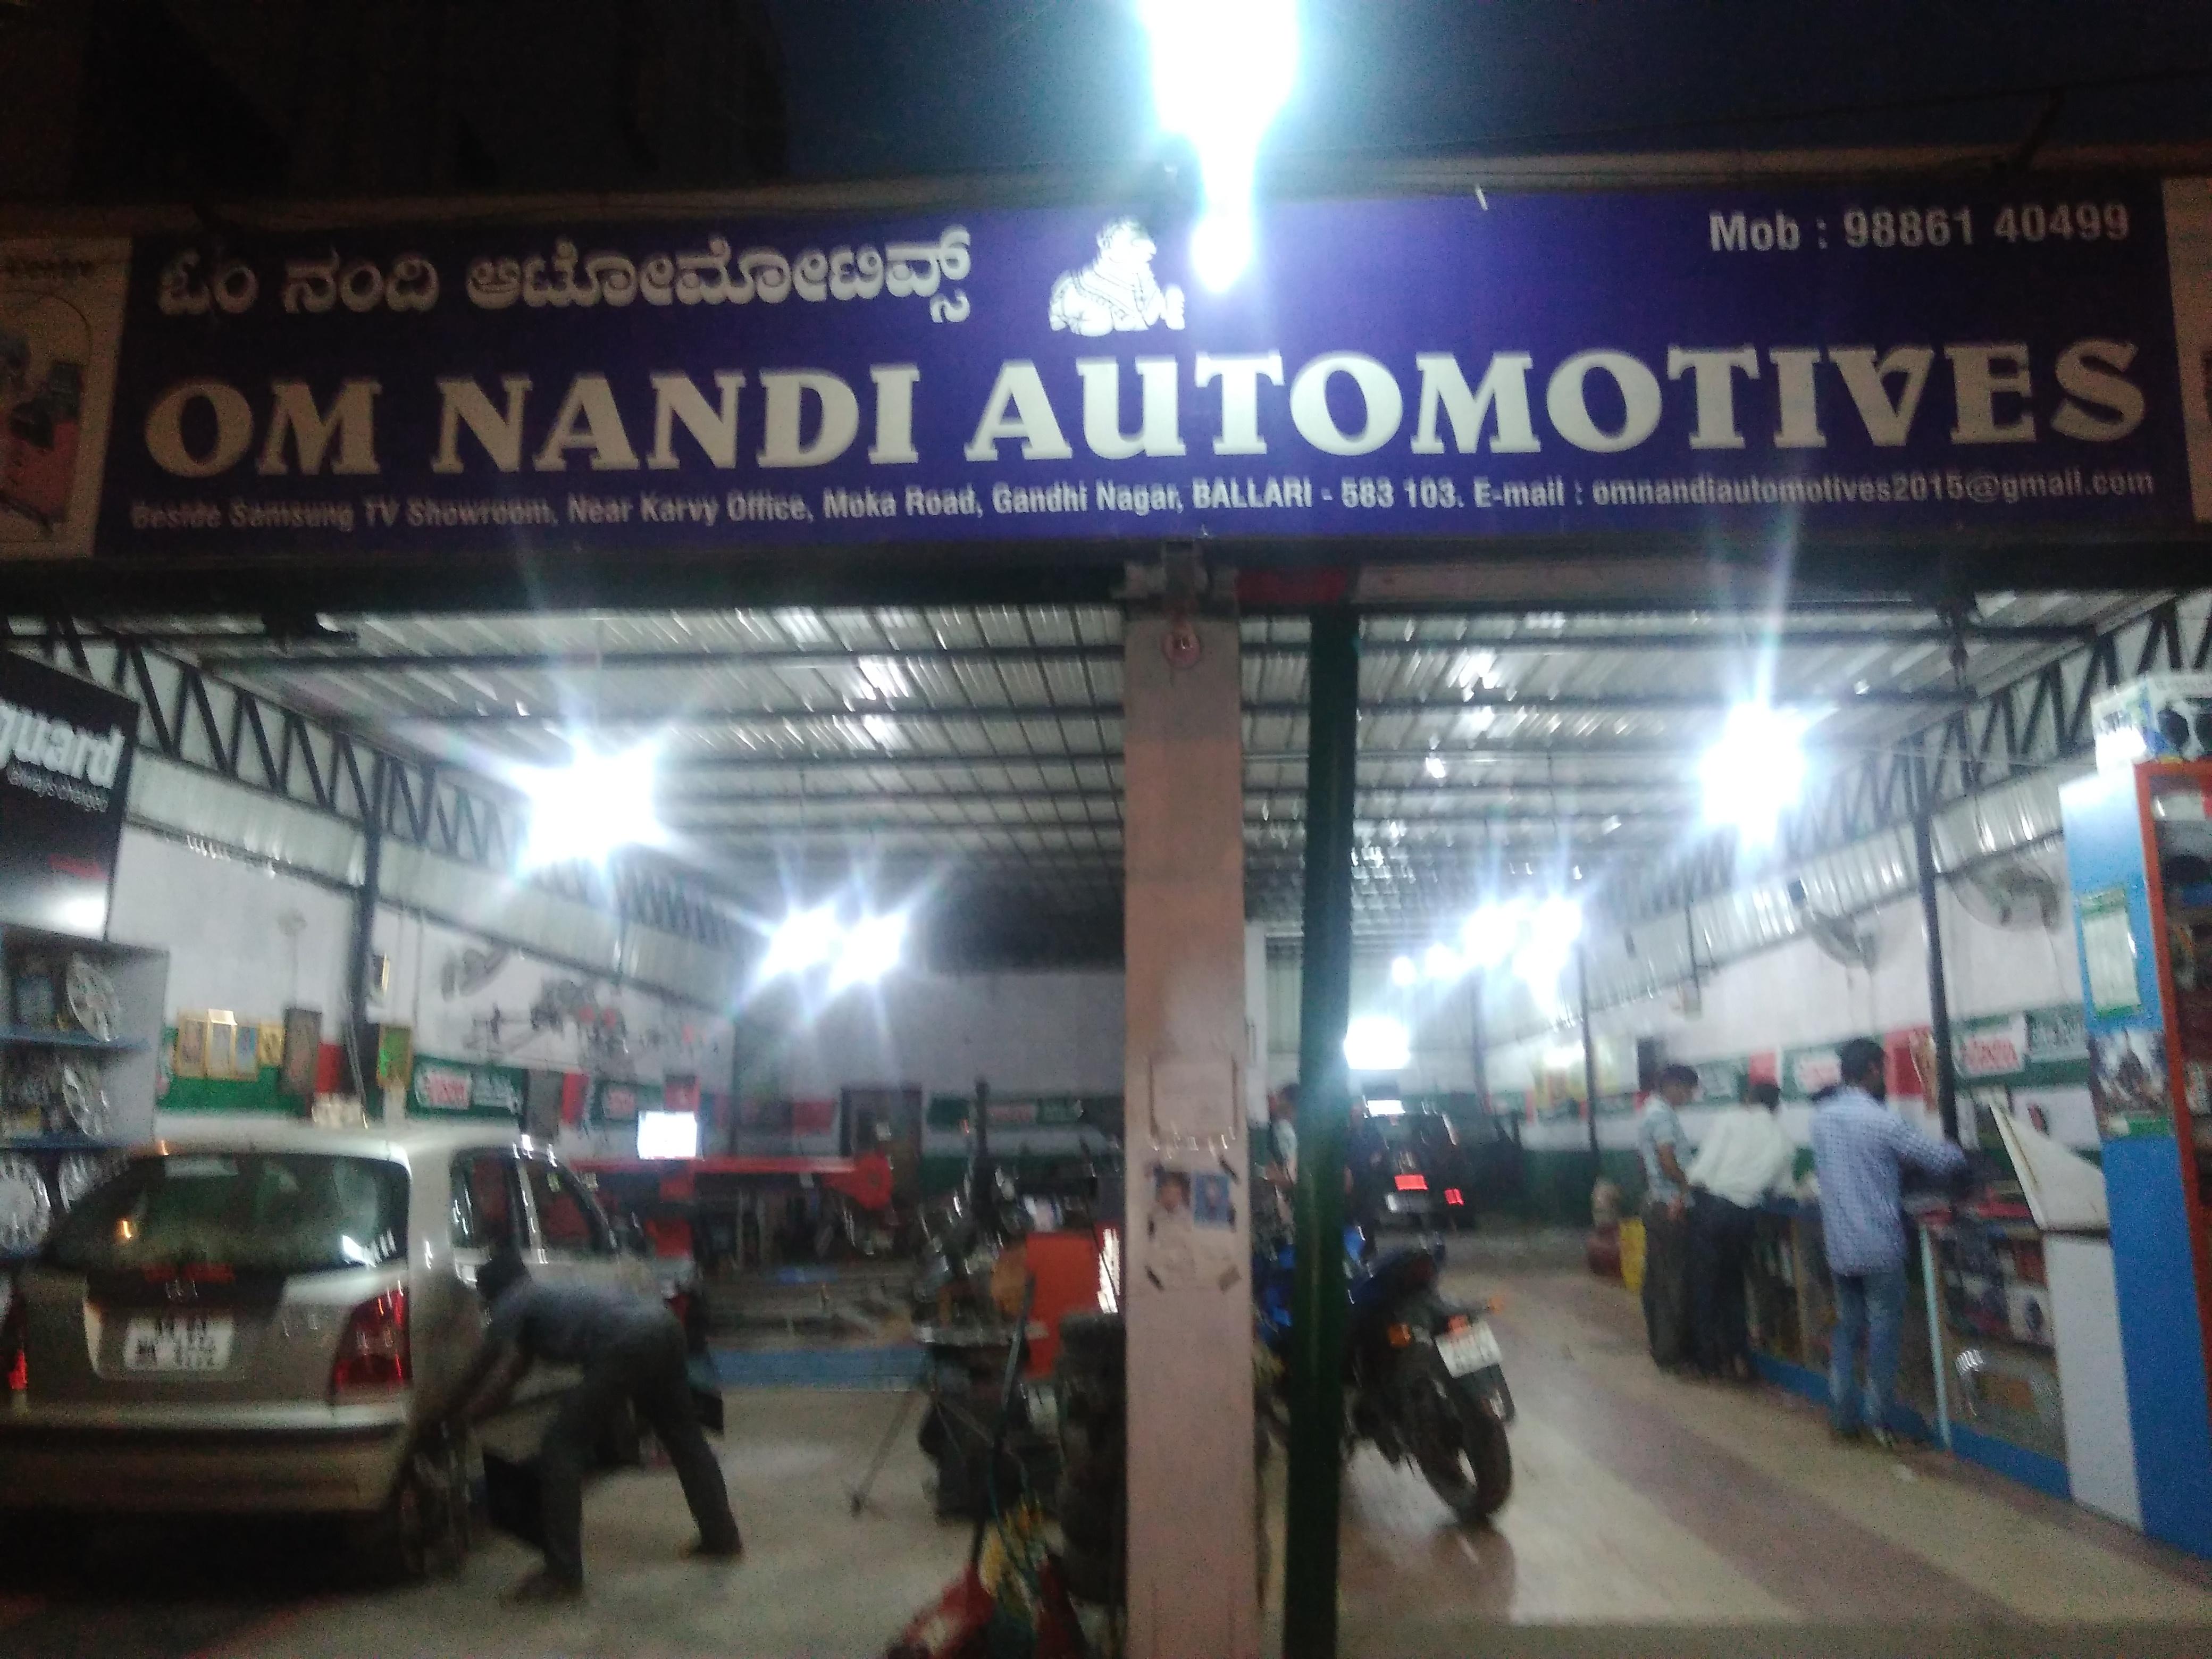 OM NANDI AUTOMOTIVES